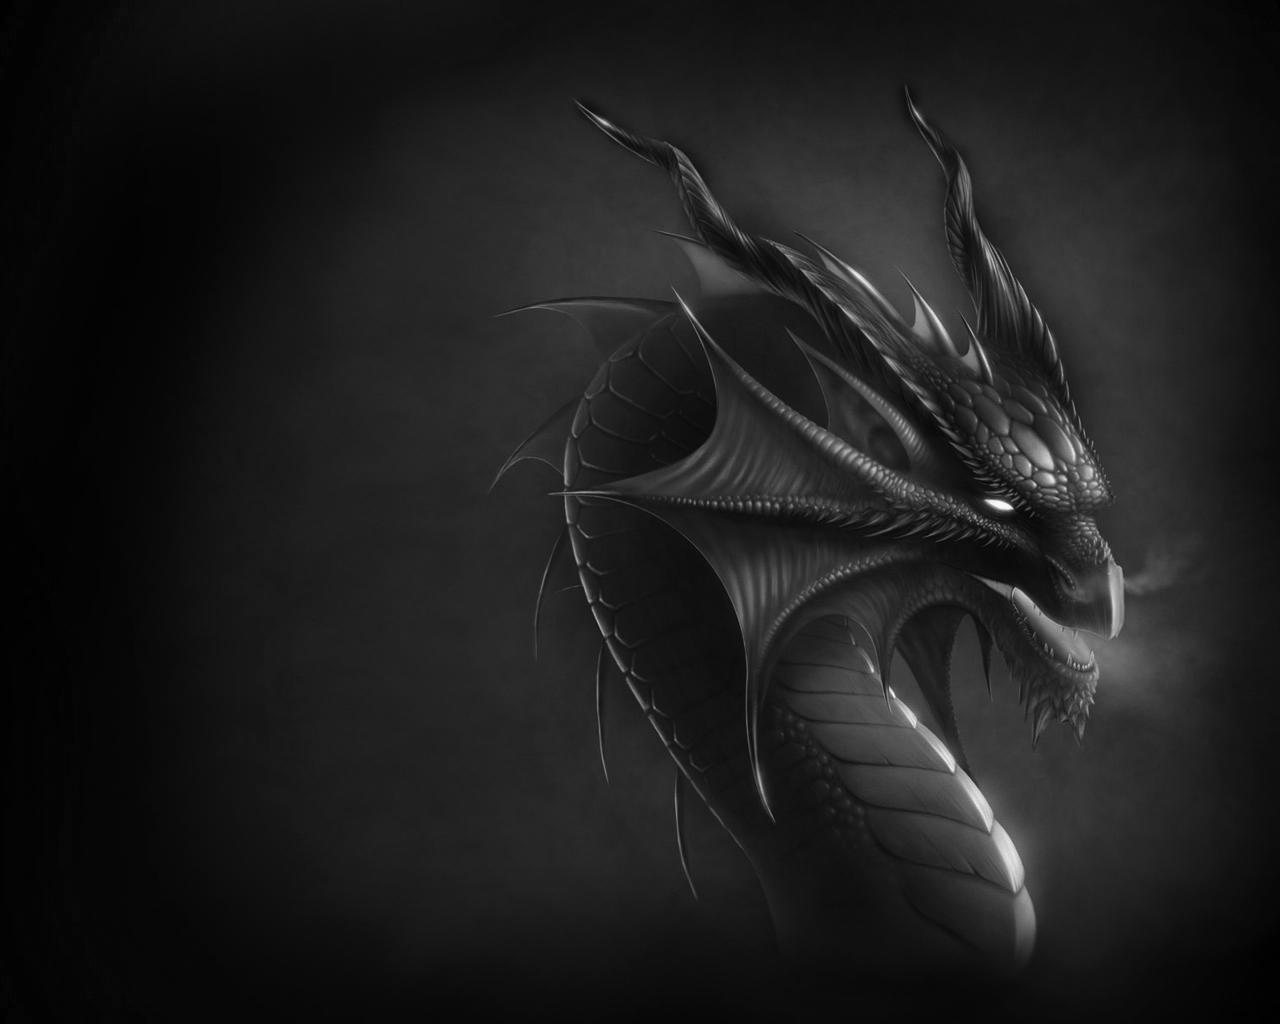 Top Hd Dragon Wallpapers Images Backgrounds Desktop 1280x1024